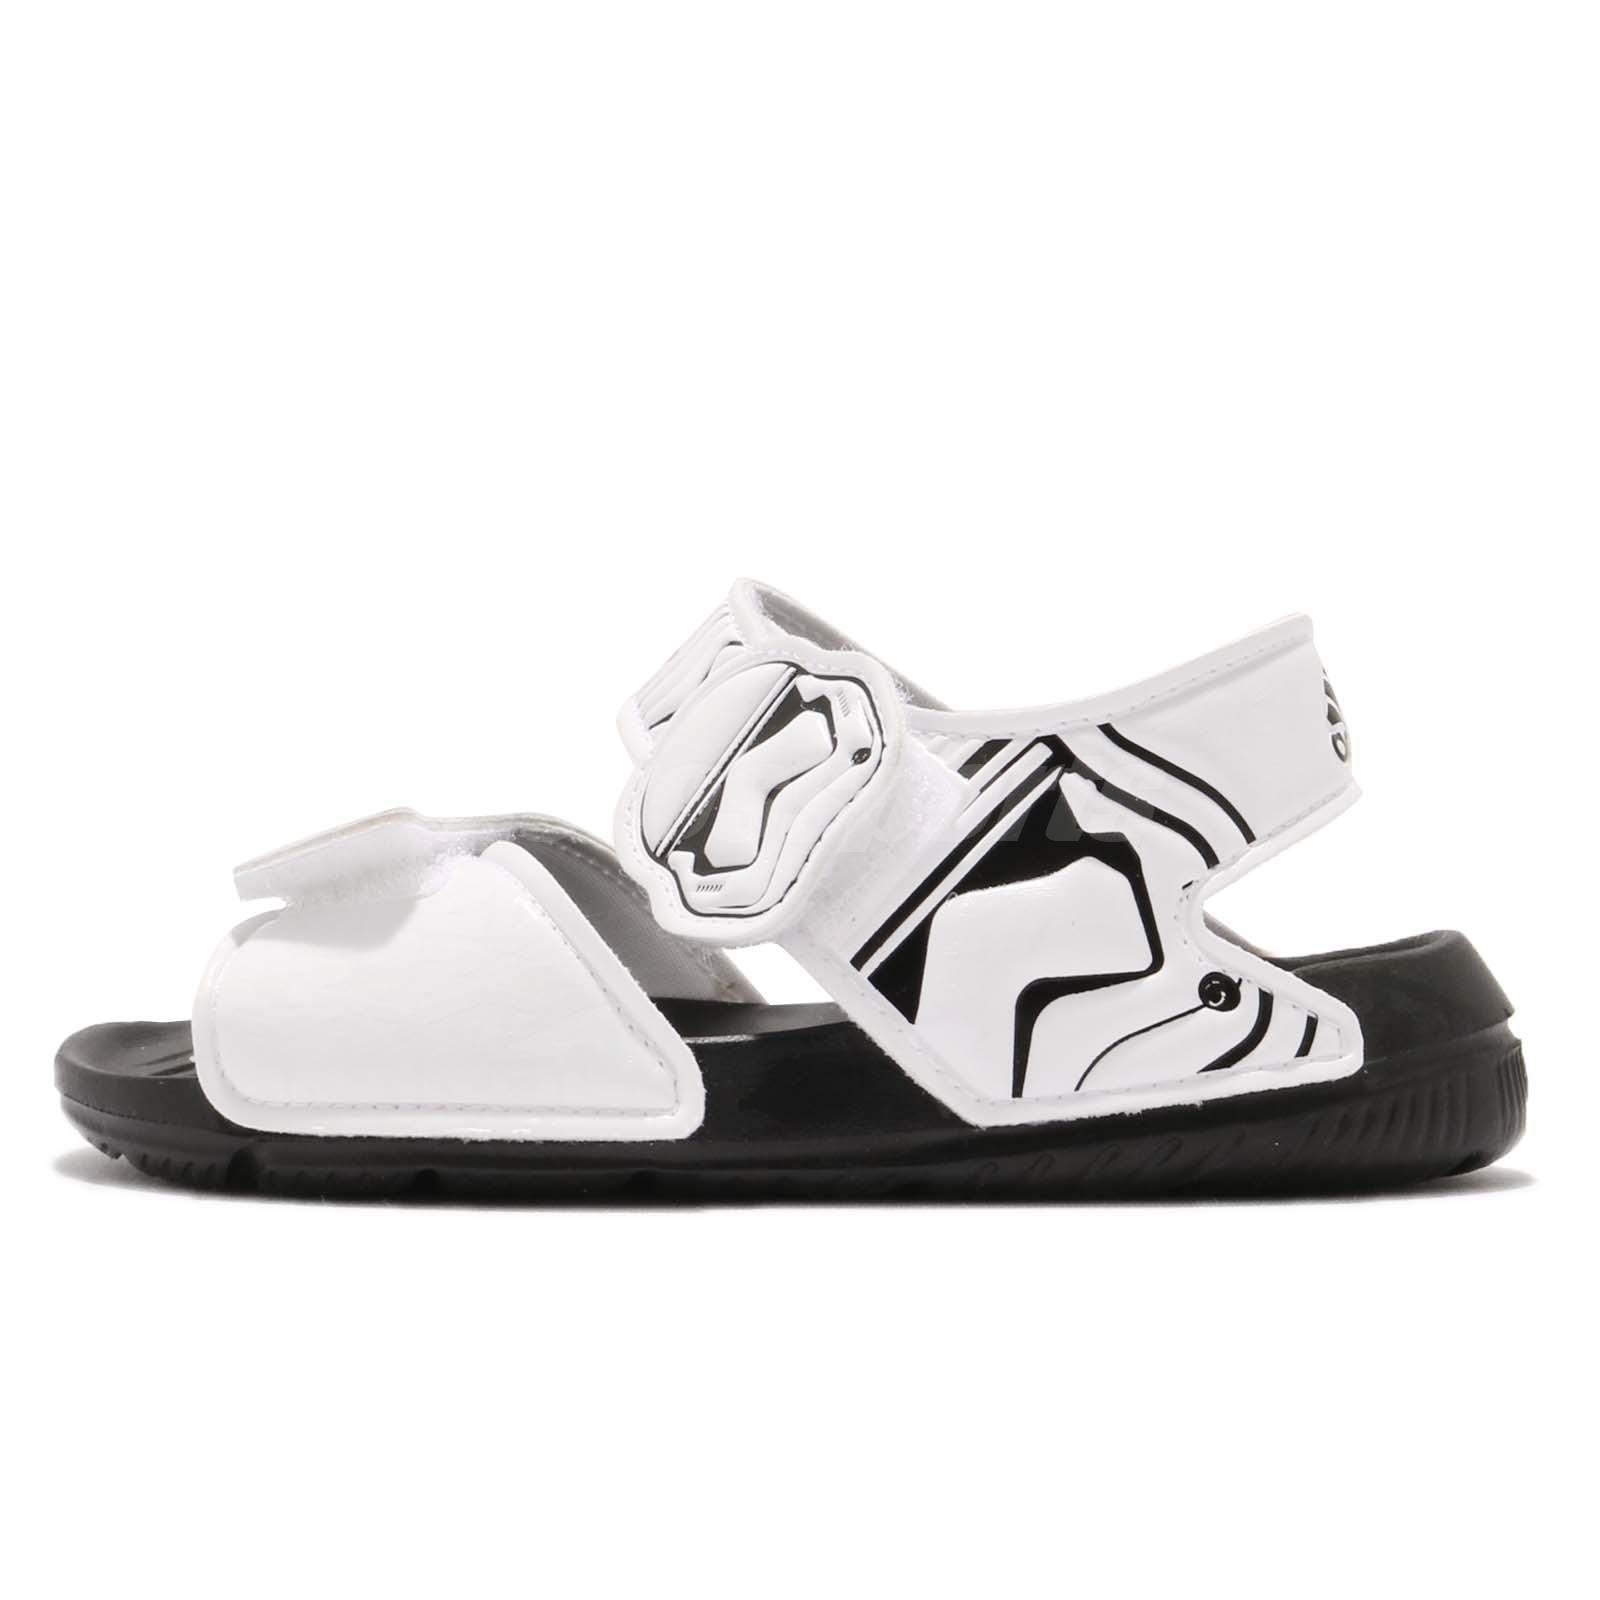 b2ea40d9d1289 adidas Star Wars AltaSwim C Stormtrooper Black White Kid Junior Sandal  CQ0127